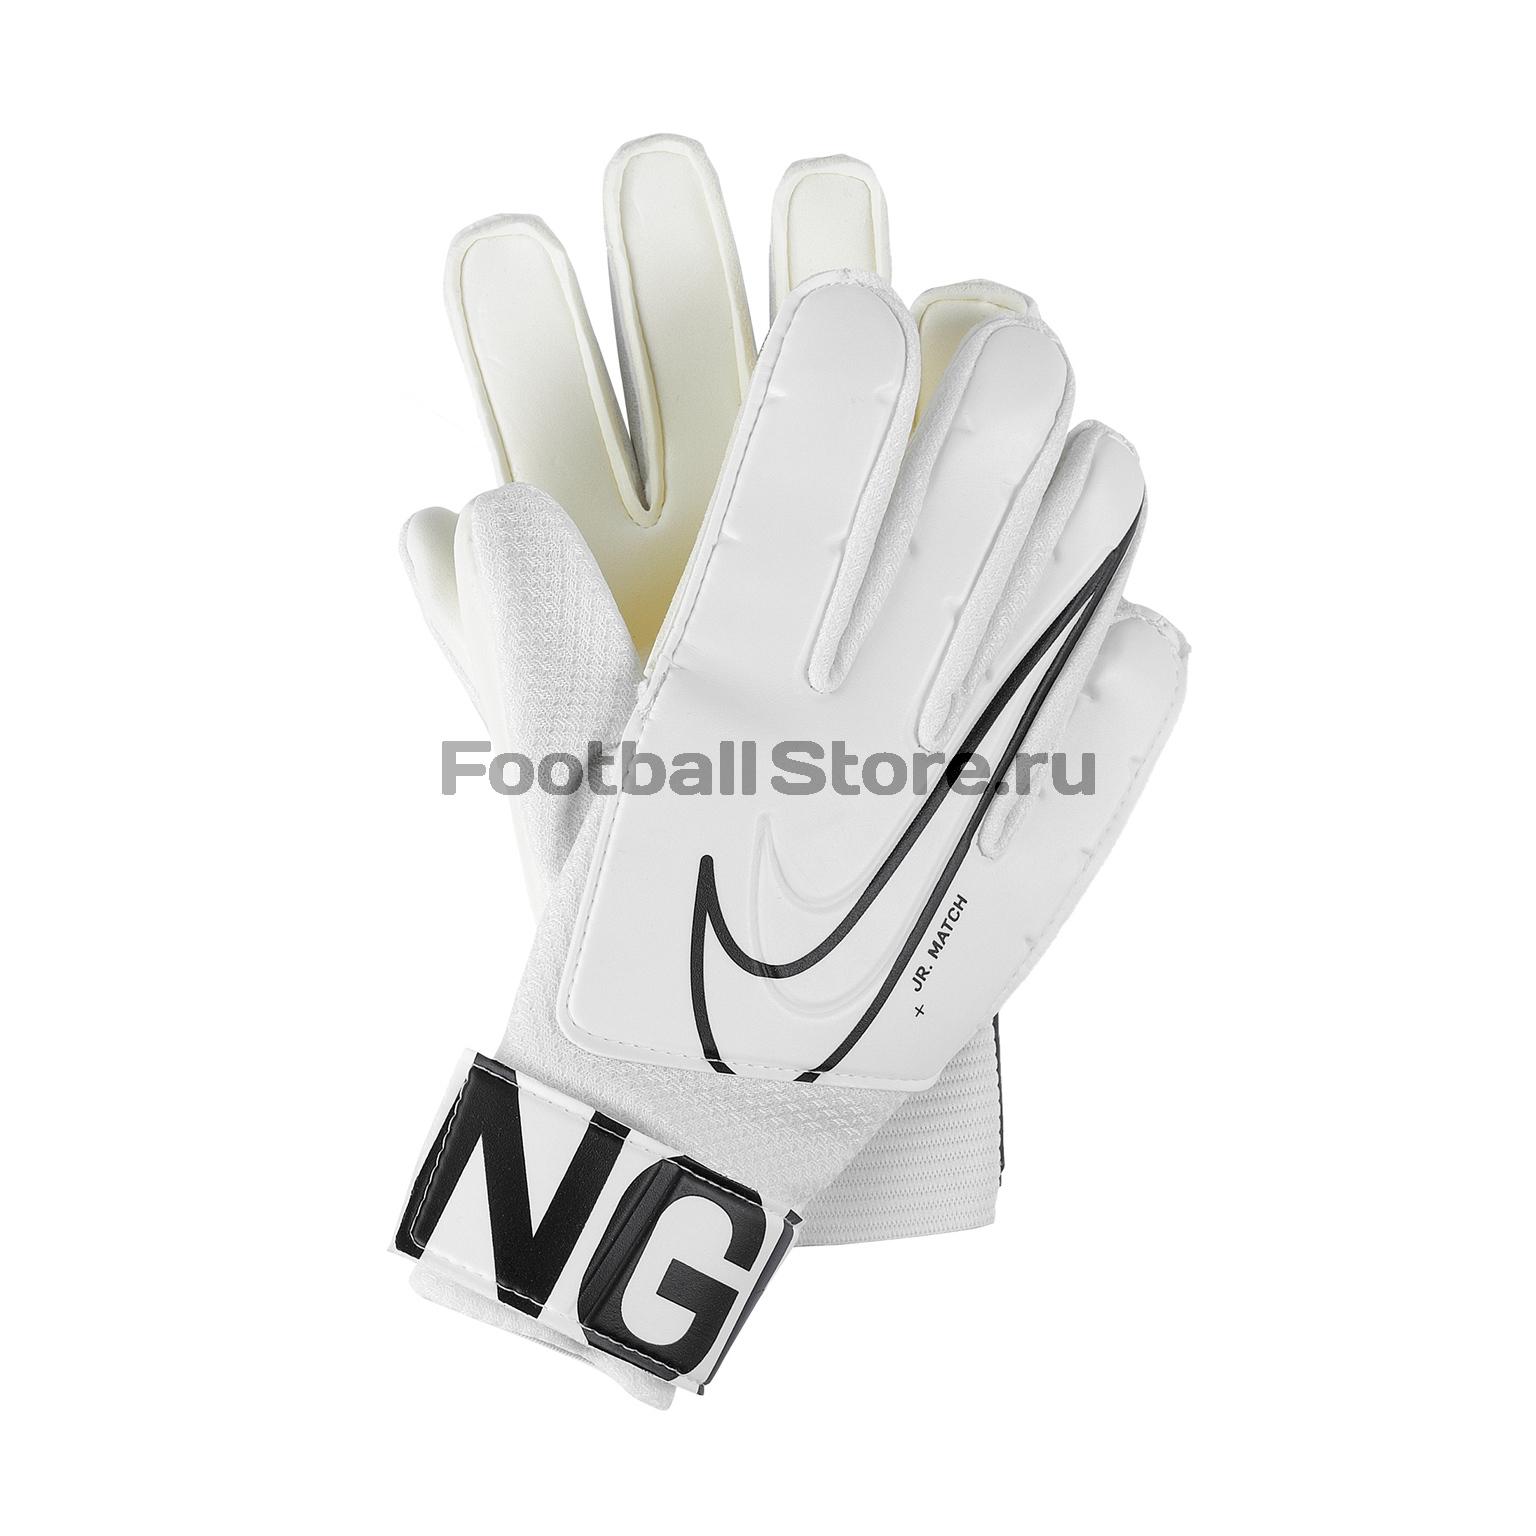 Перчатки вратарские детские Nike Match GS3883-100